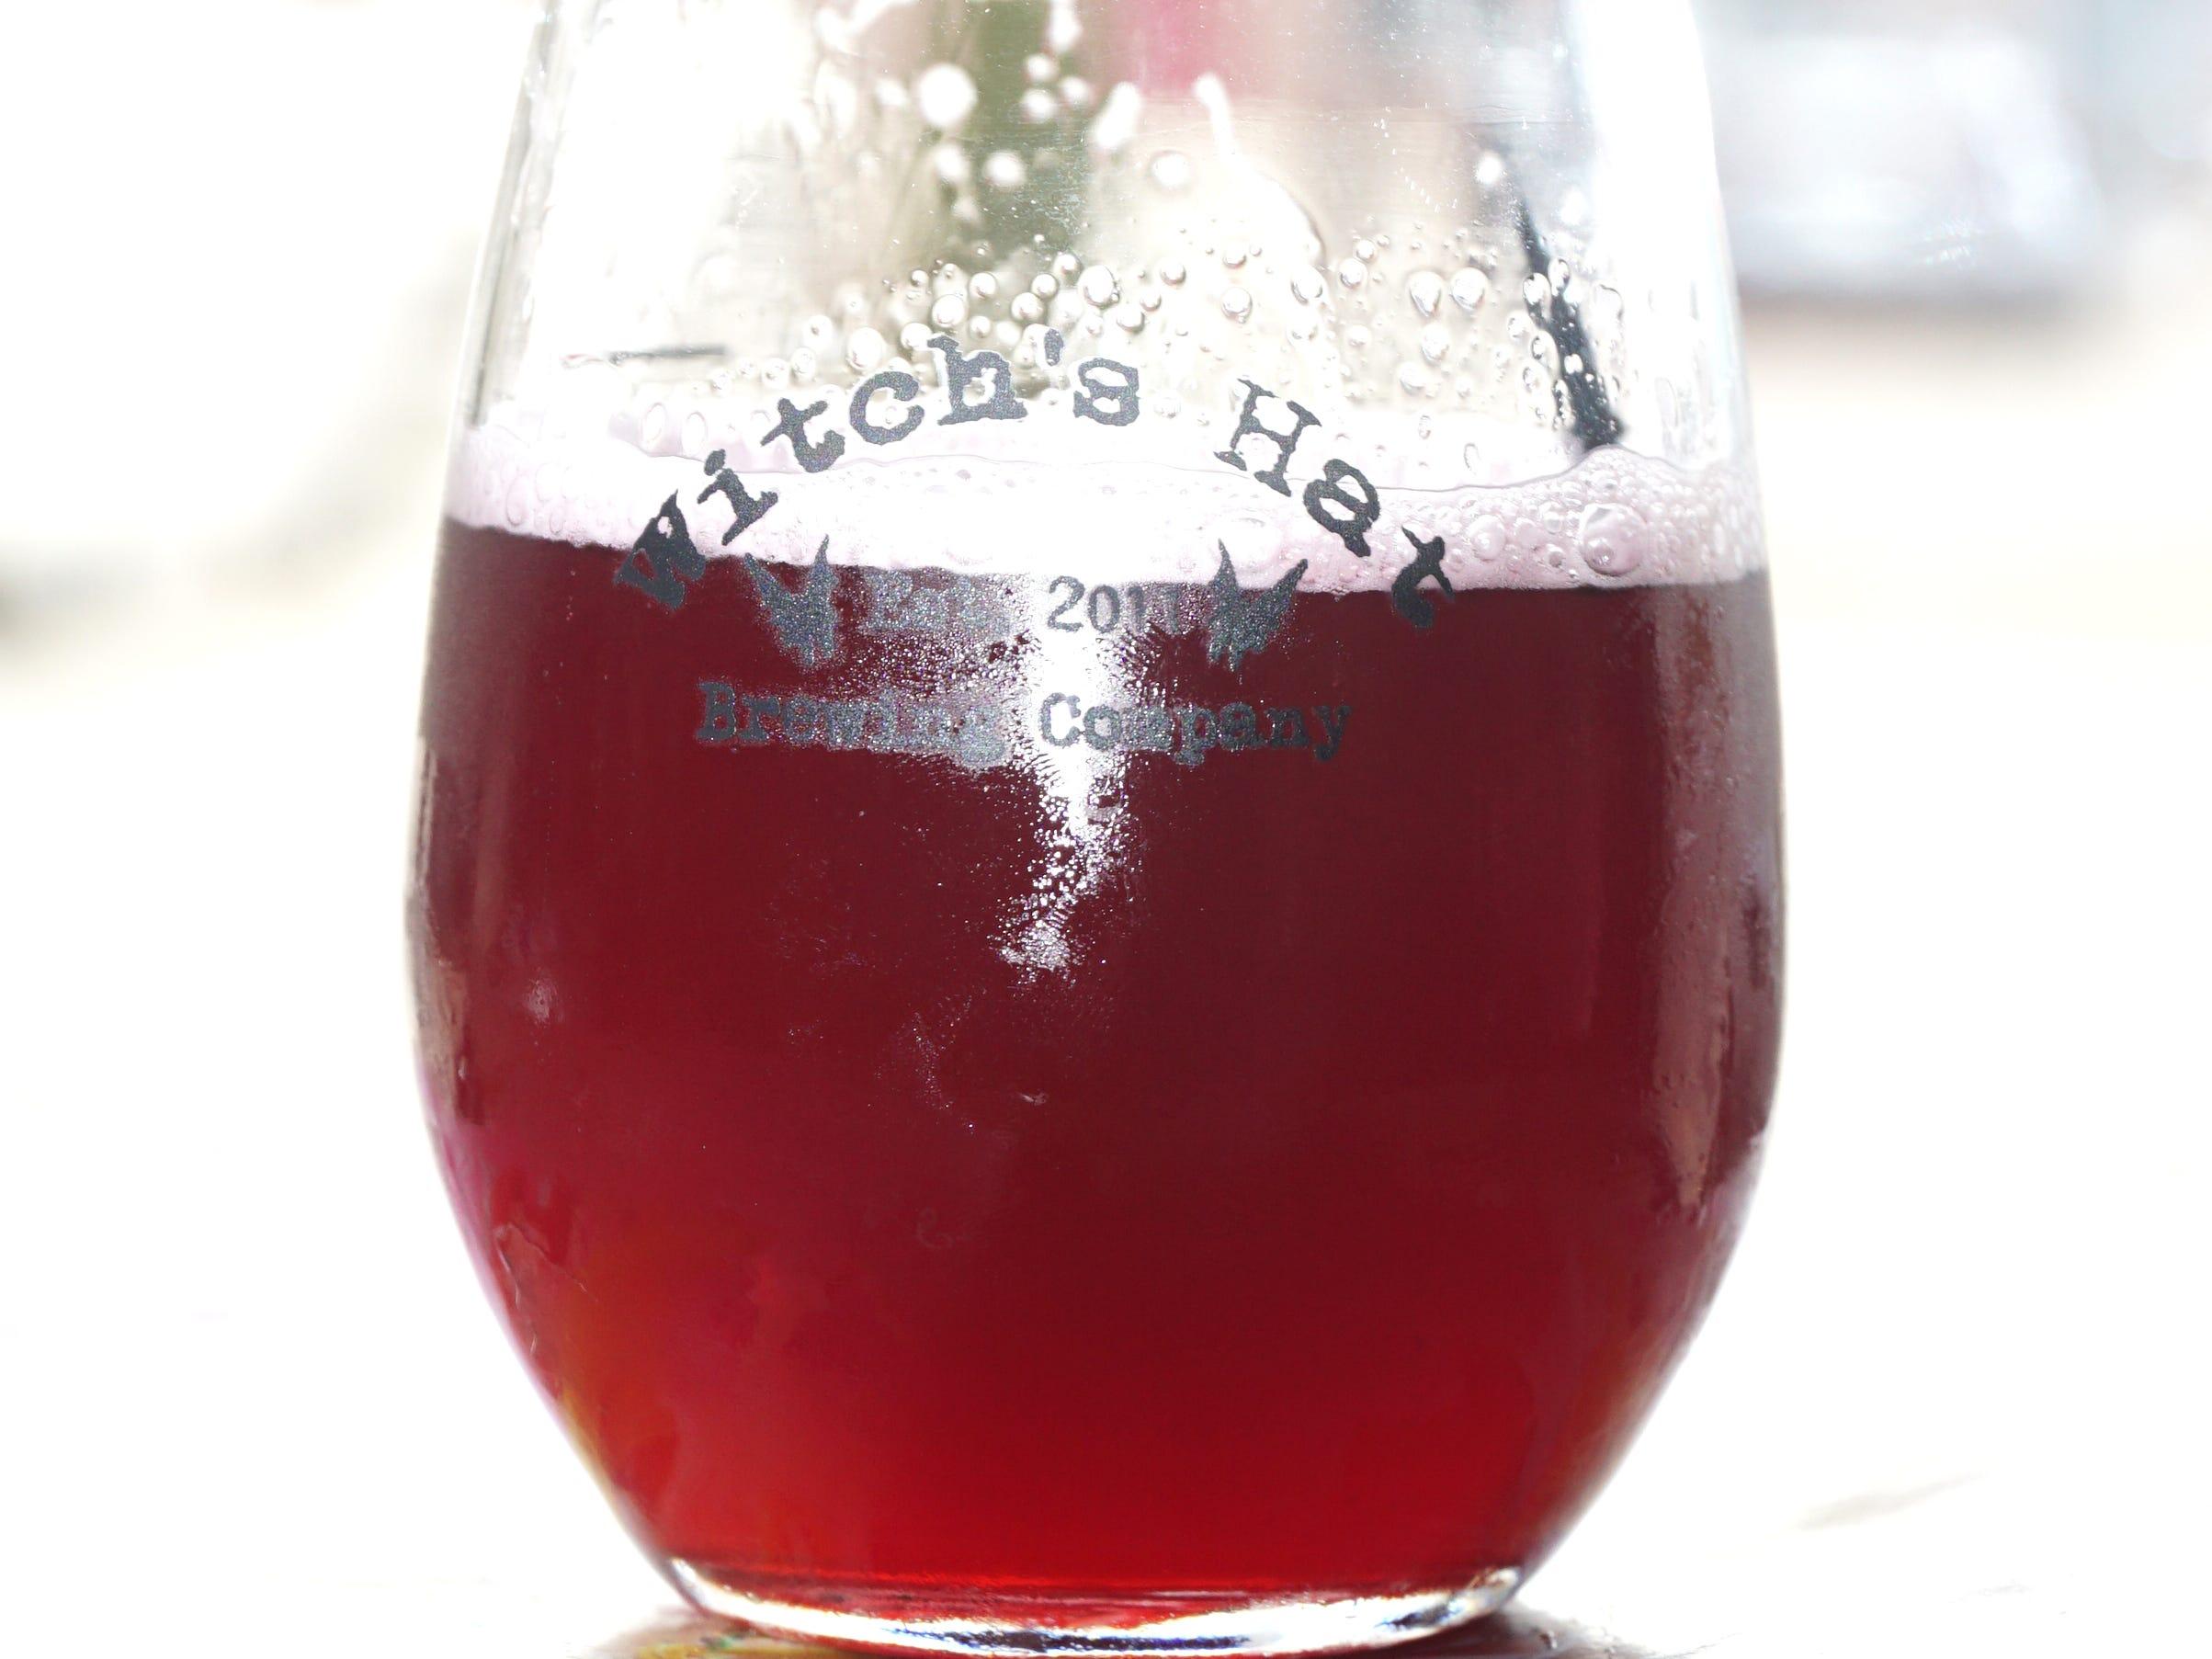 Witch's Hat Blueberry-Lemonade gose brew.